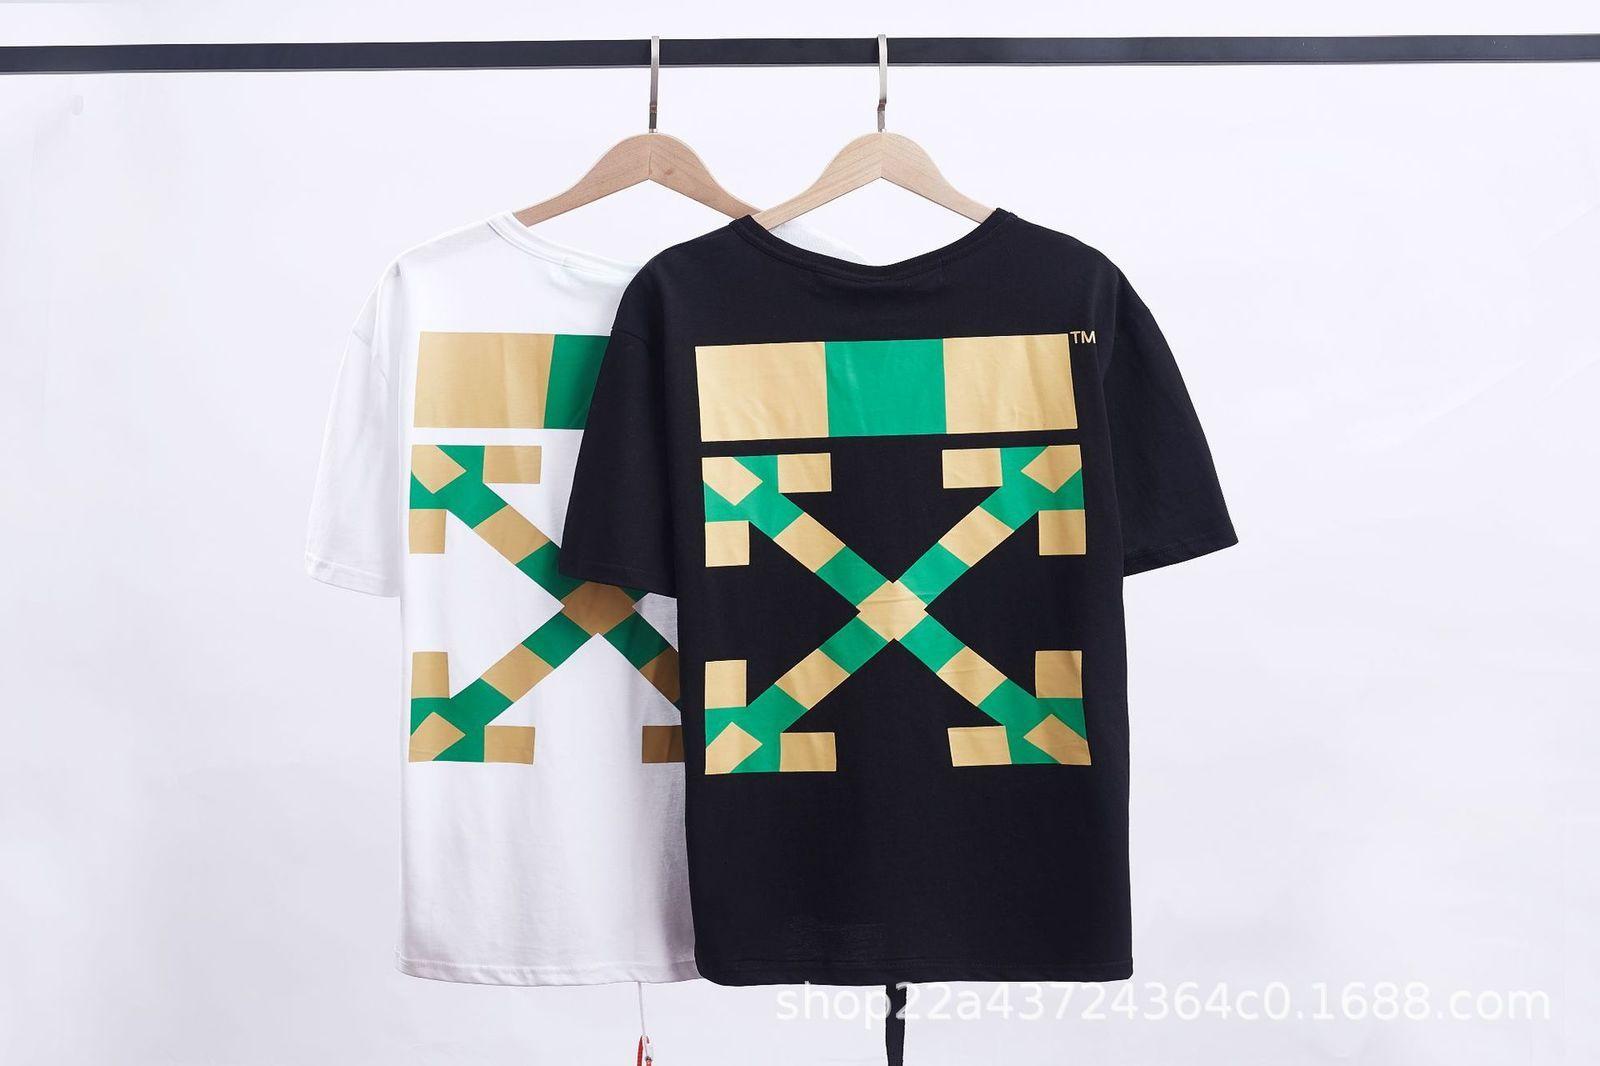 2021 Primavera verano nueva marca de moda fuera de Sudáfrica Classic arrow Camiseta de longitud media de manga corta y de manga corta